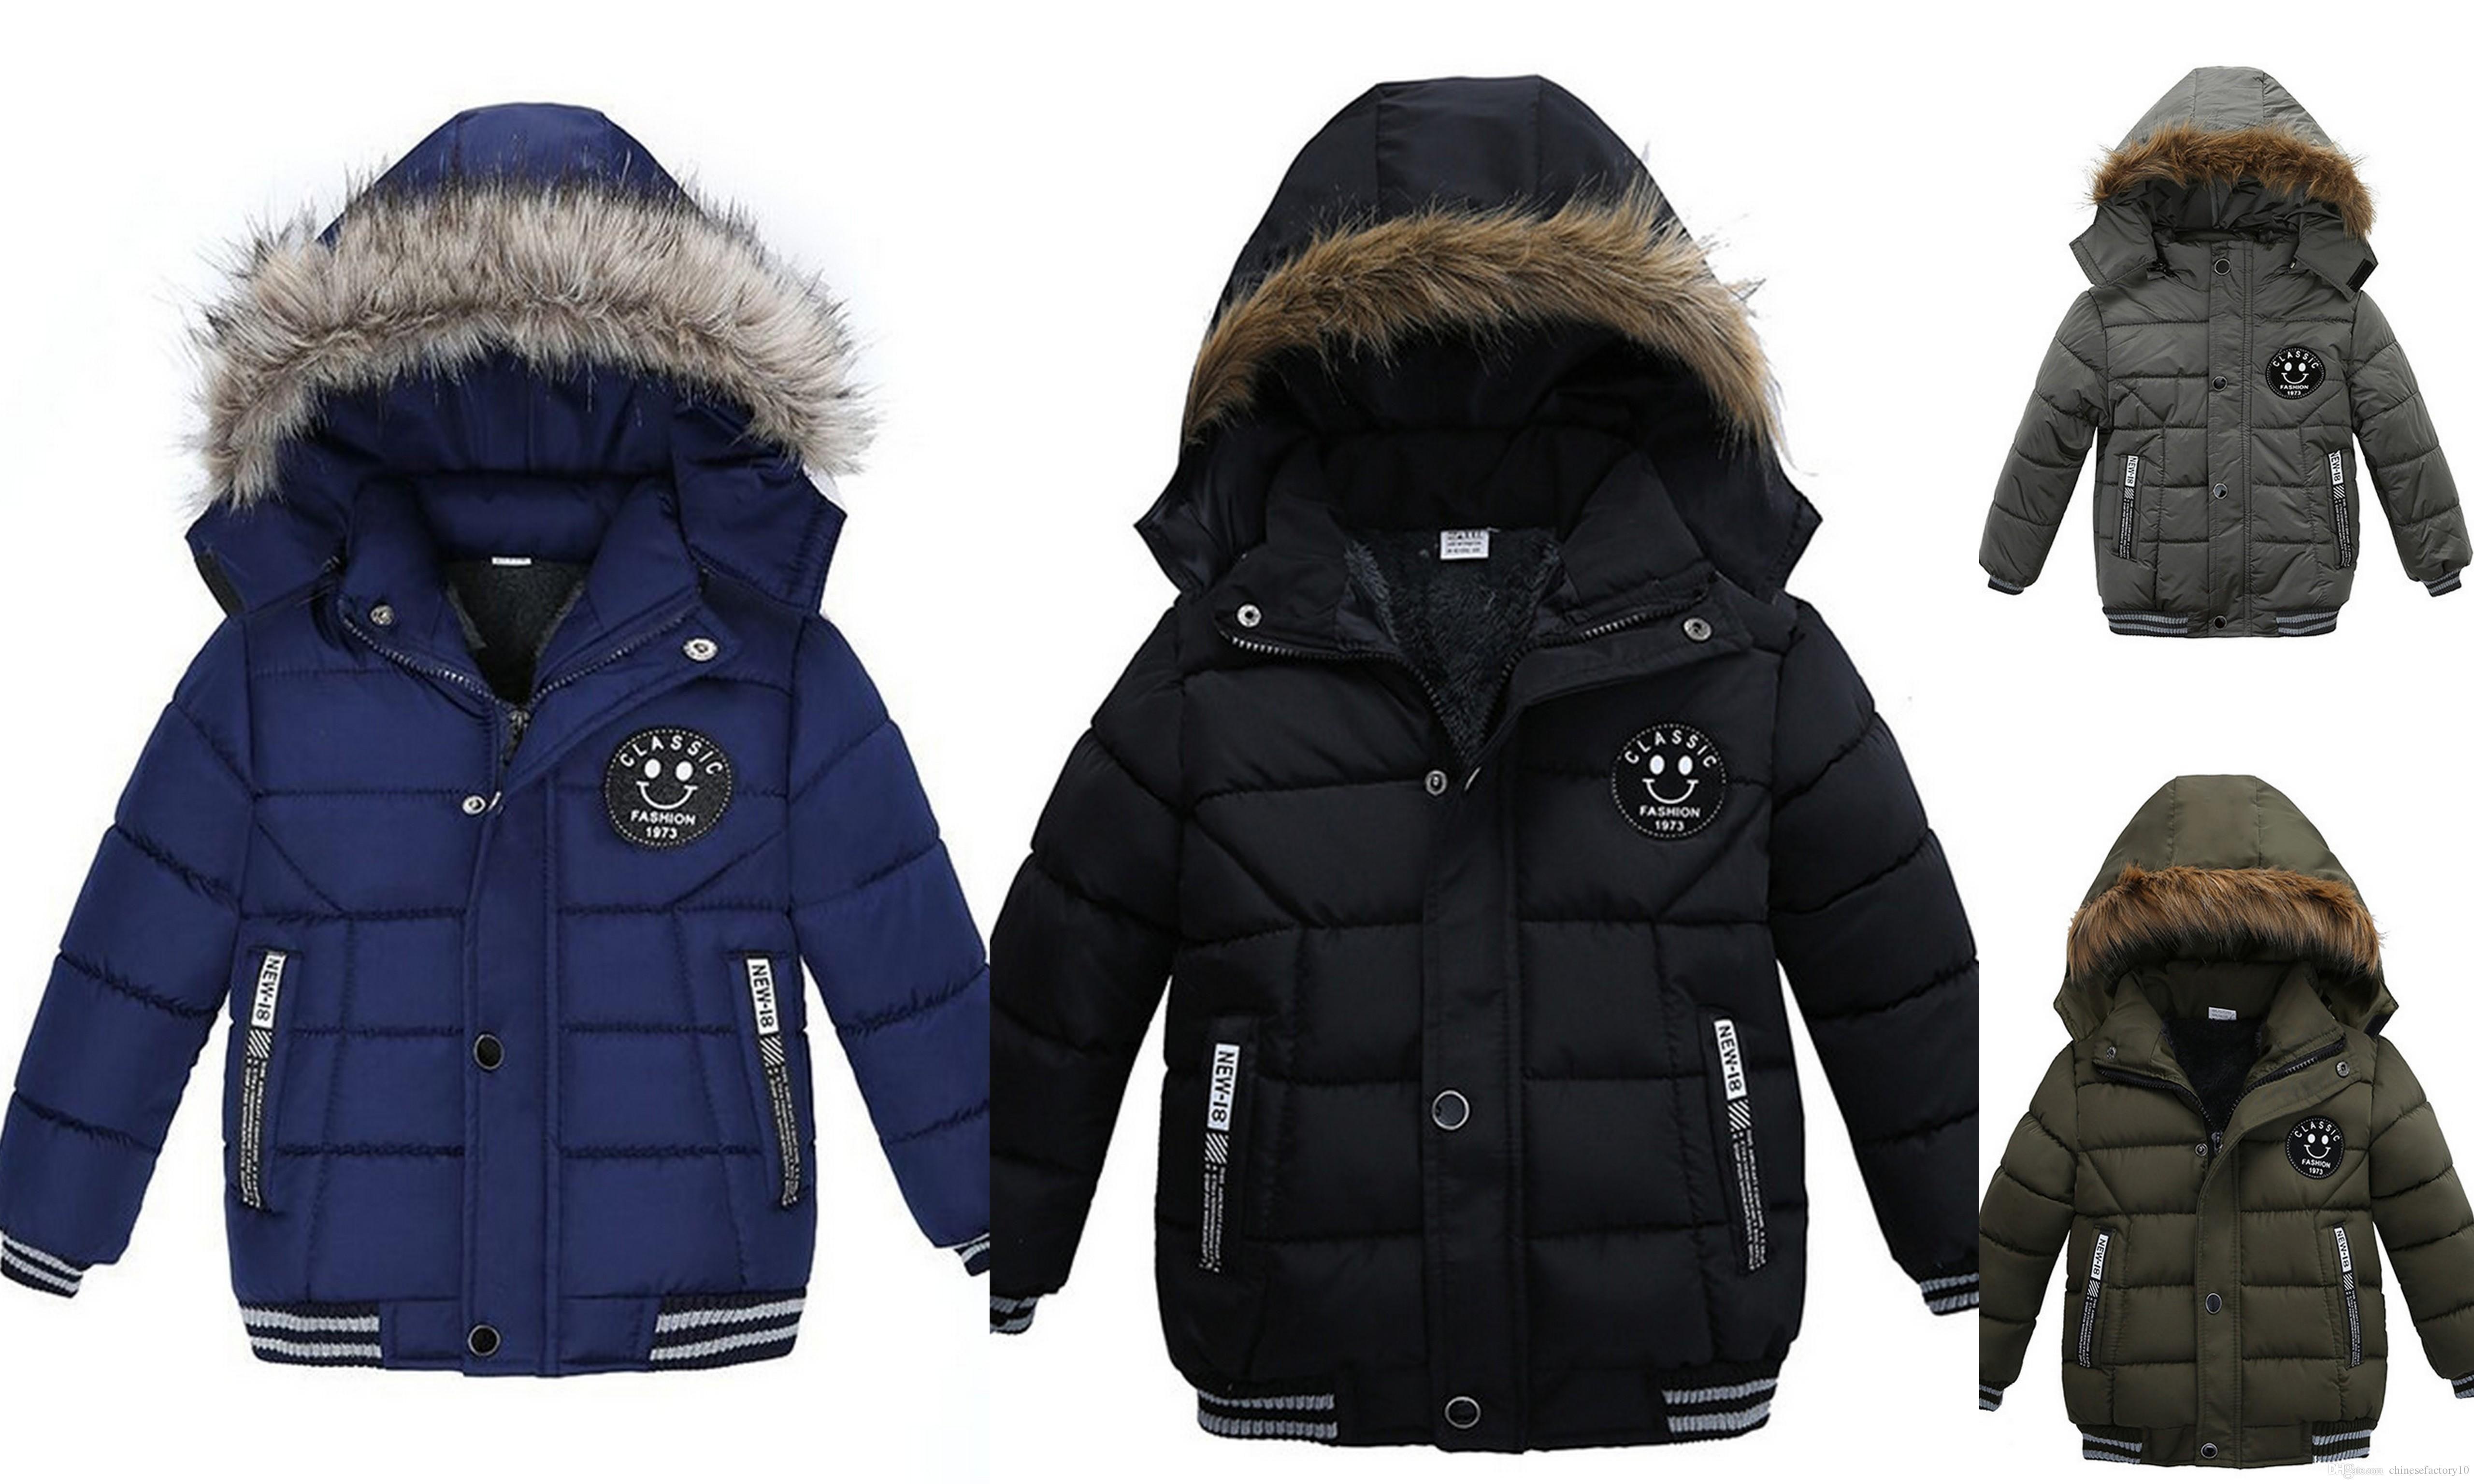 77ba6280a winter jackets for kids